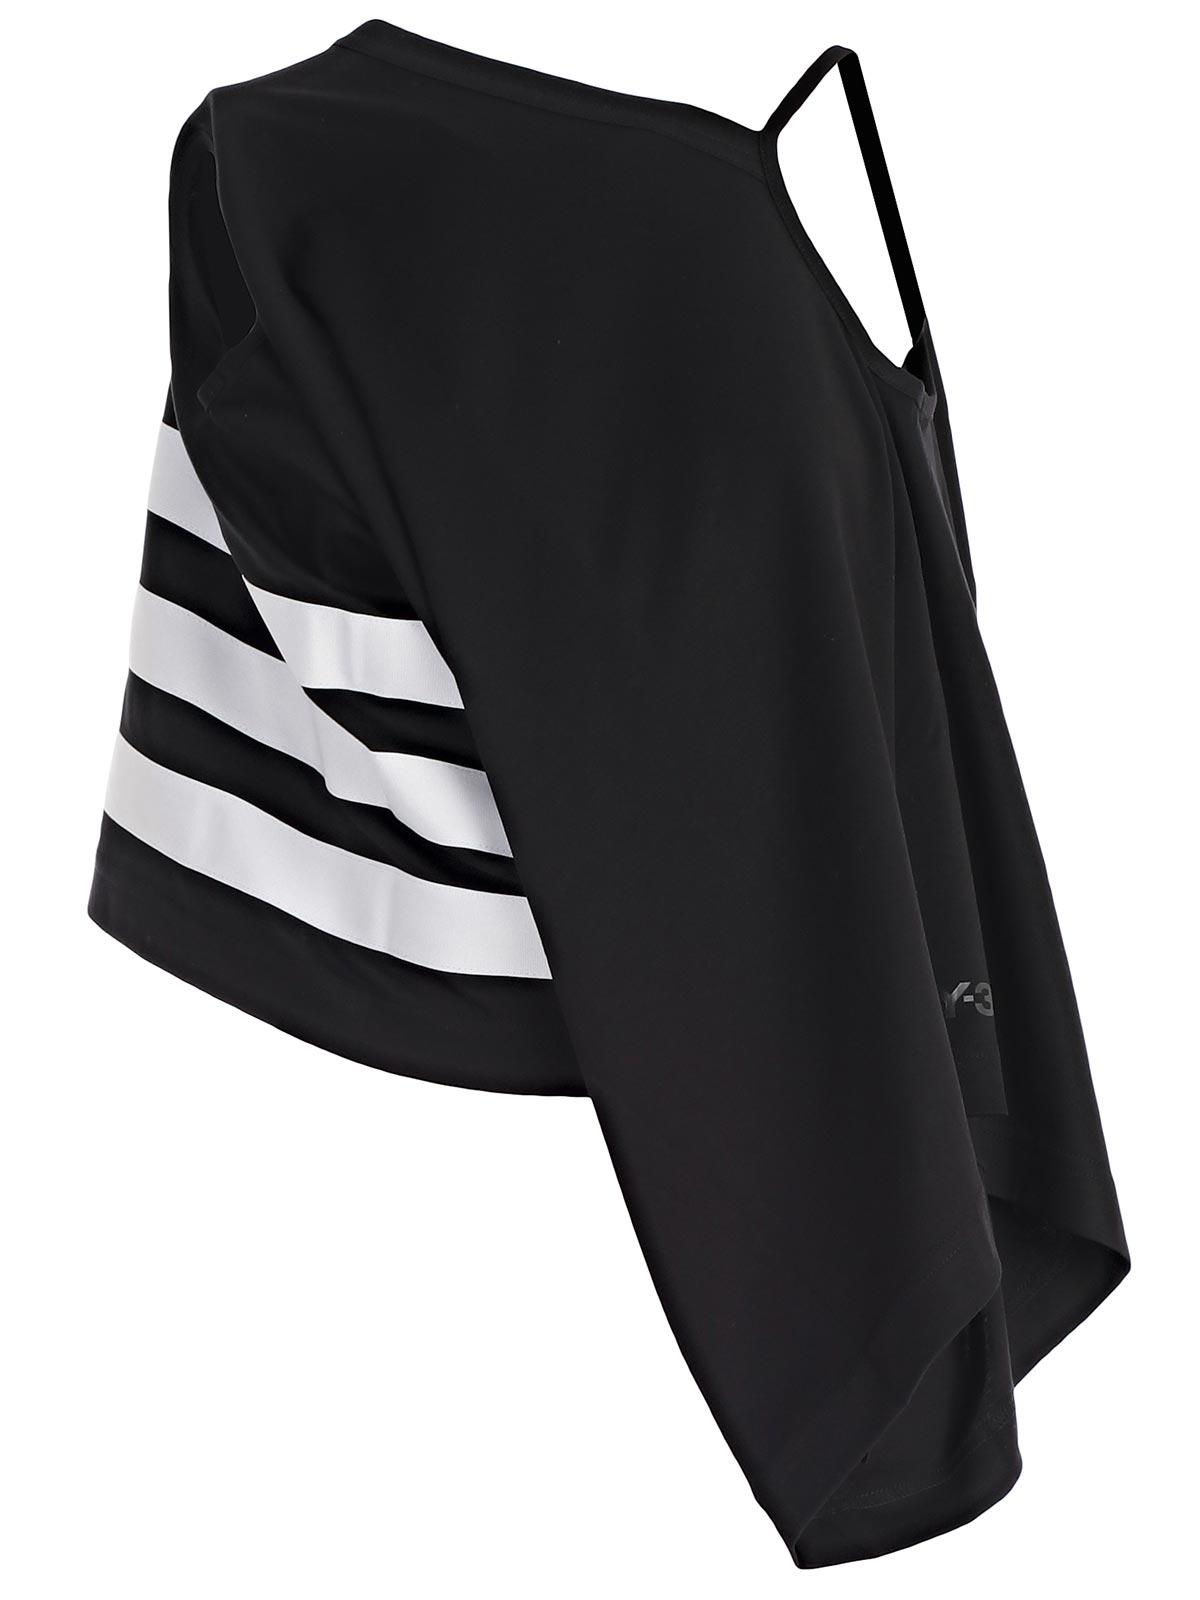 Picture of Y-3 Yohji Yamamoto Adidas  Top